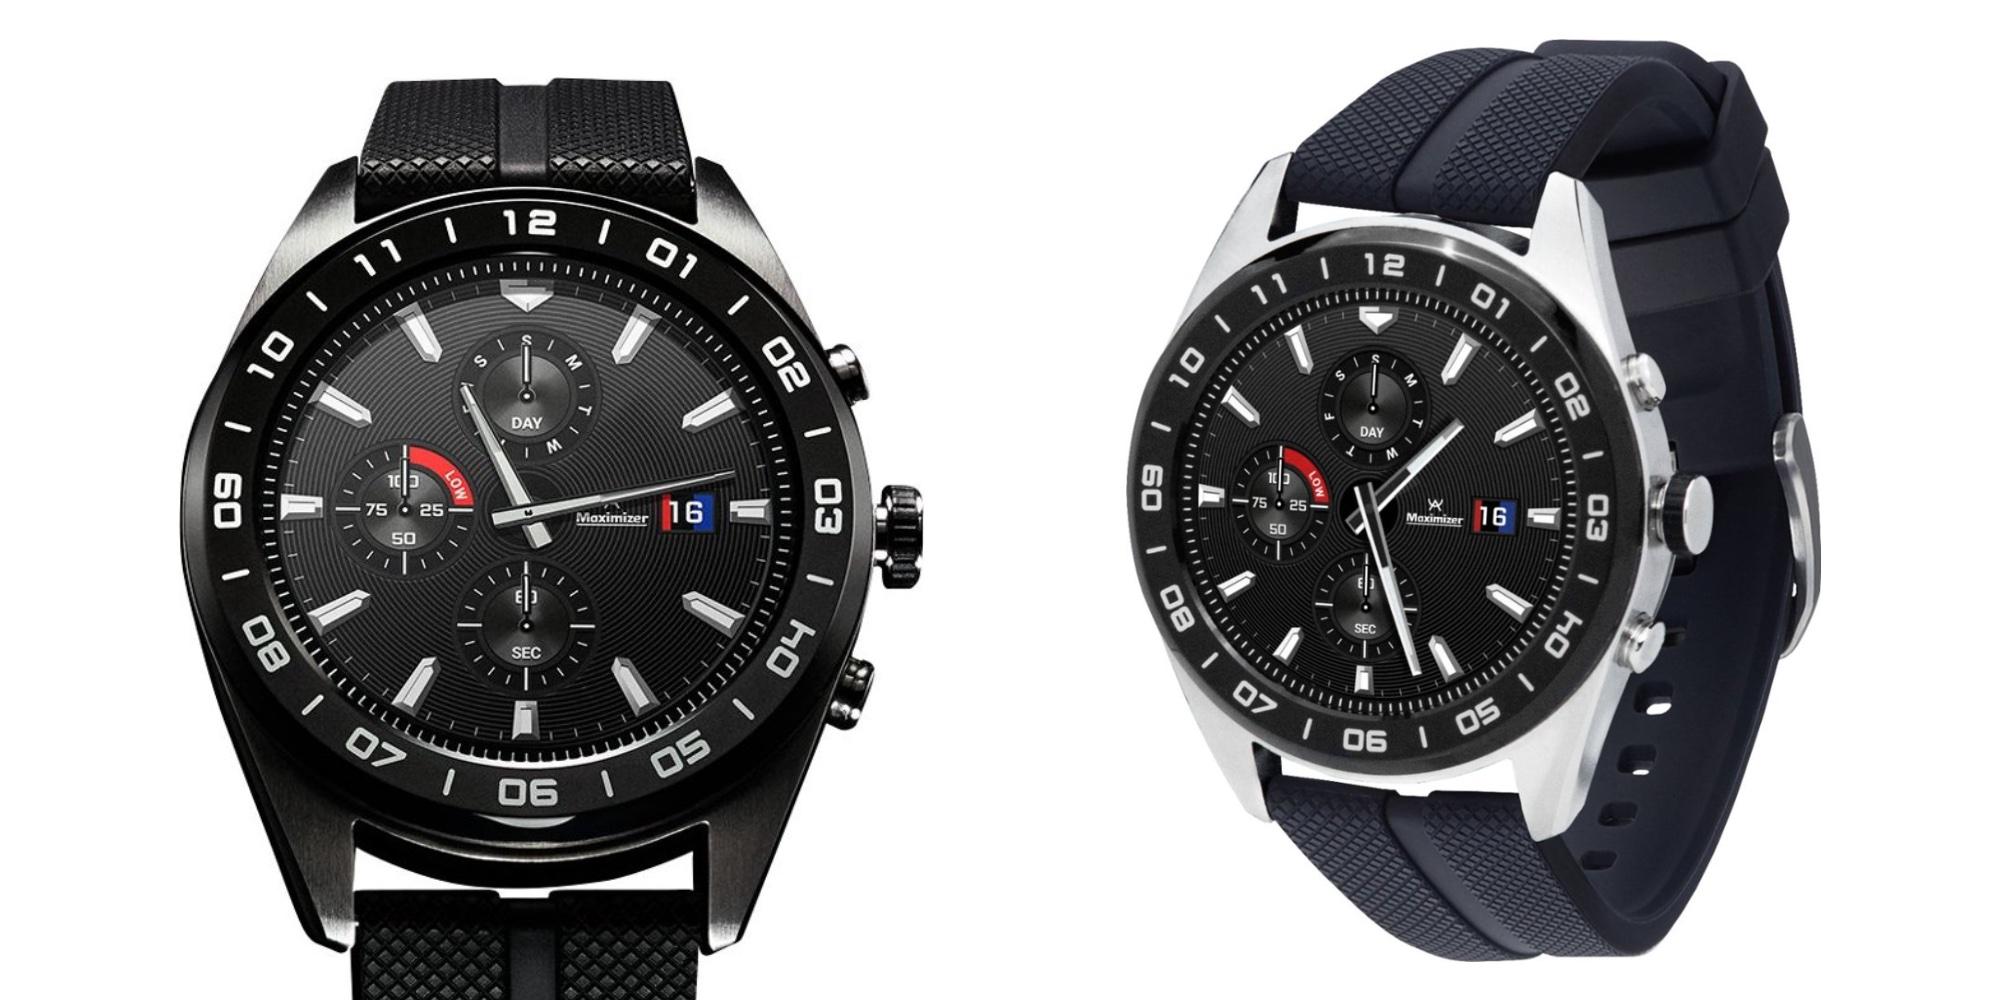 LG Watch W7 Smartwatch ab 200 US-Dollar, Anker Accessoire ab 10 US-Dollar und mehr